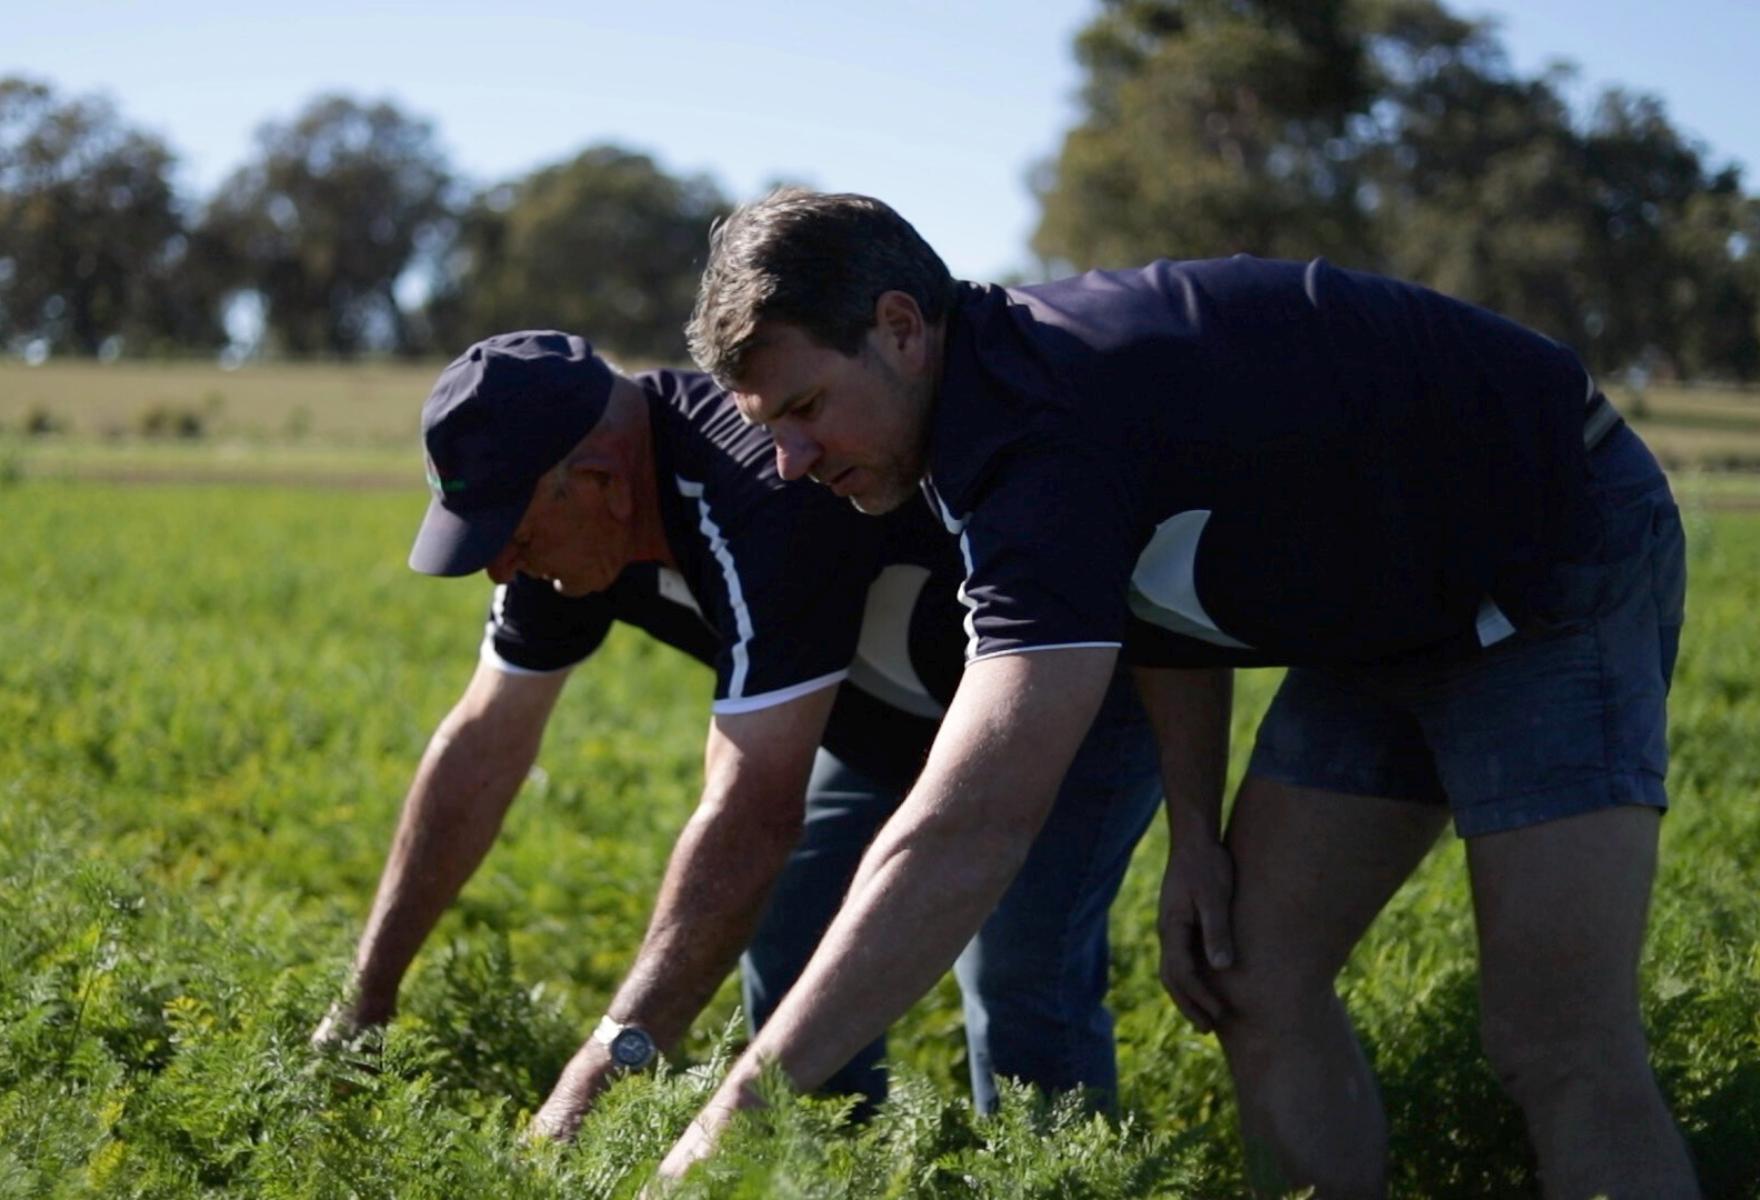 Farmers picking carrots